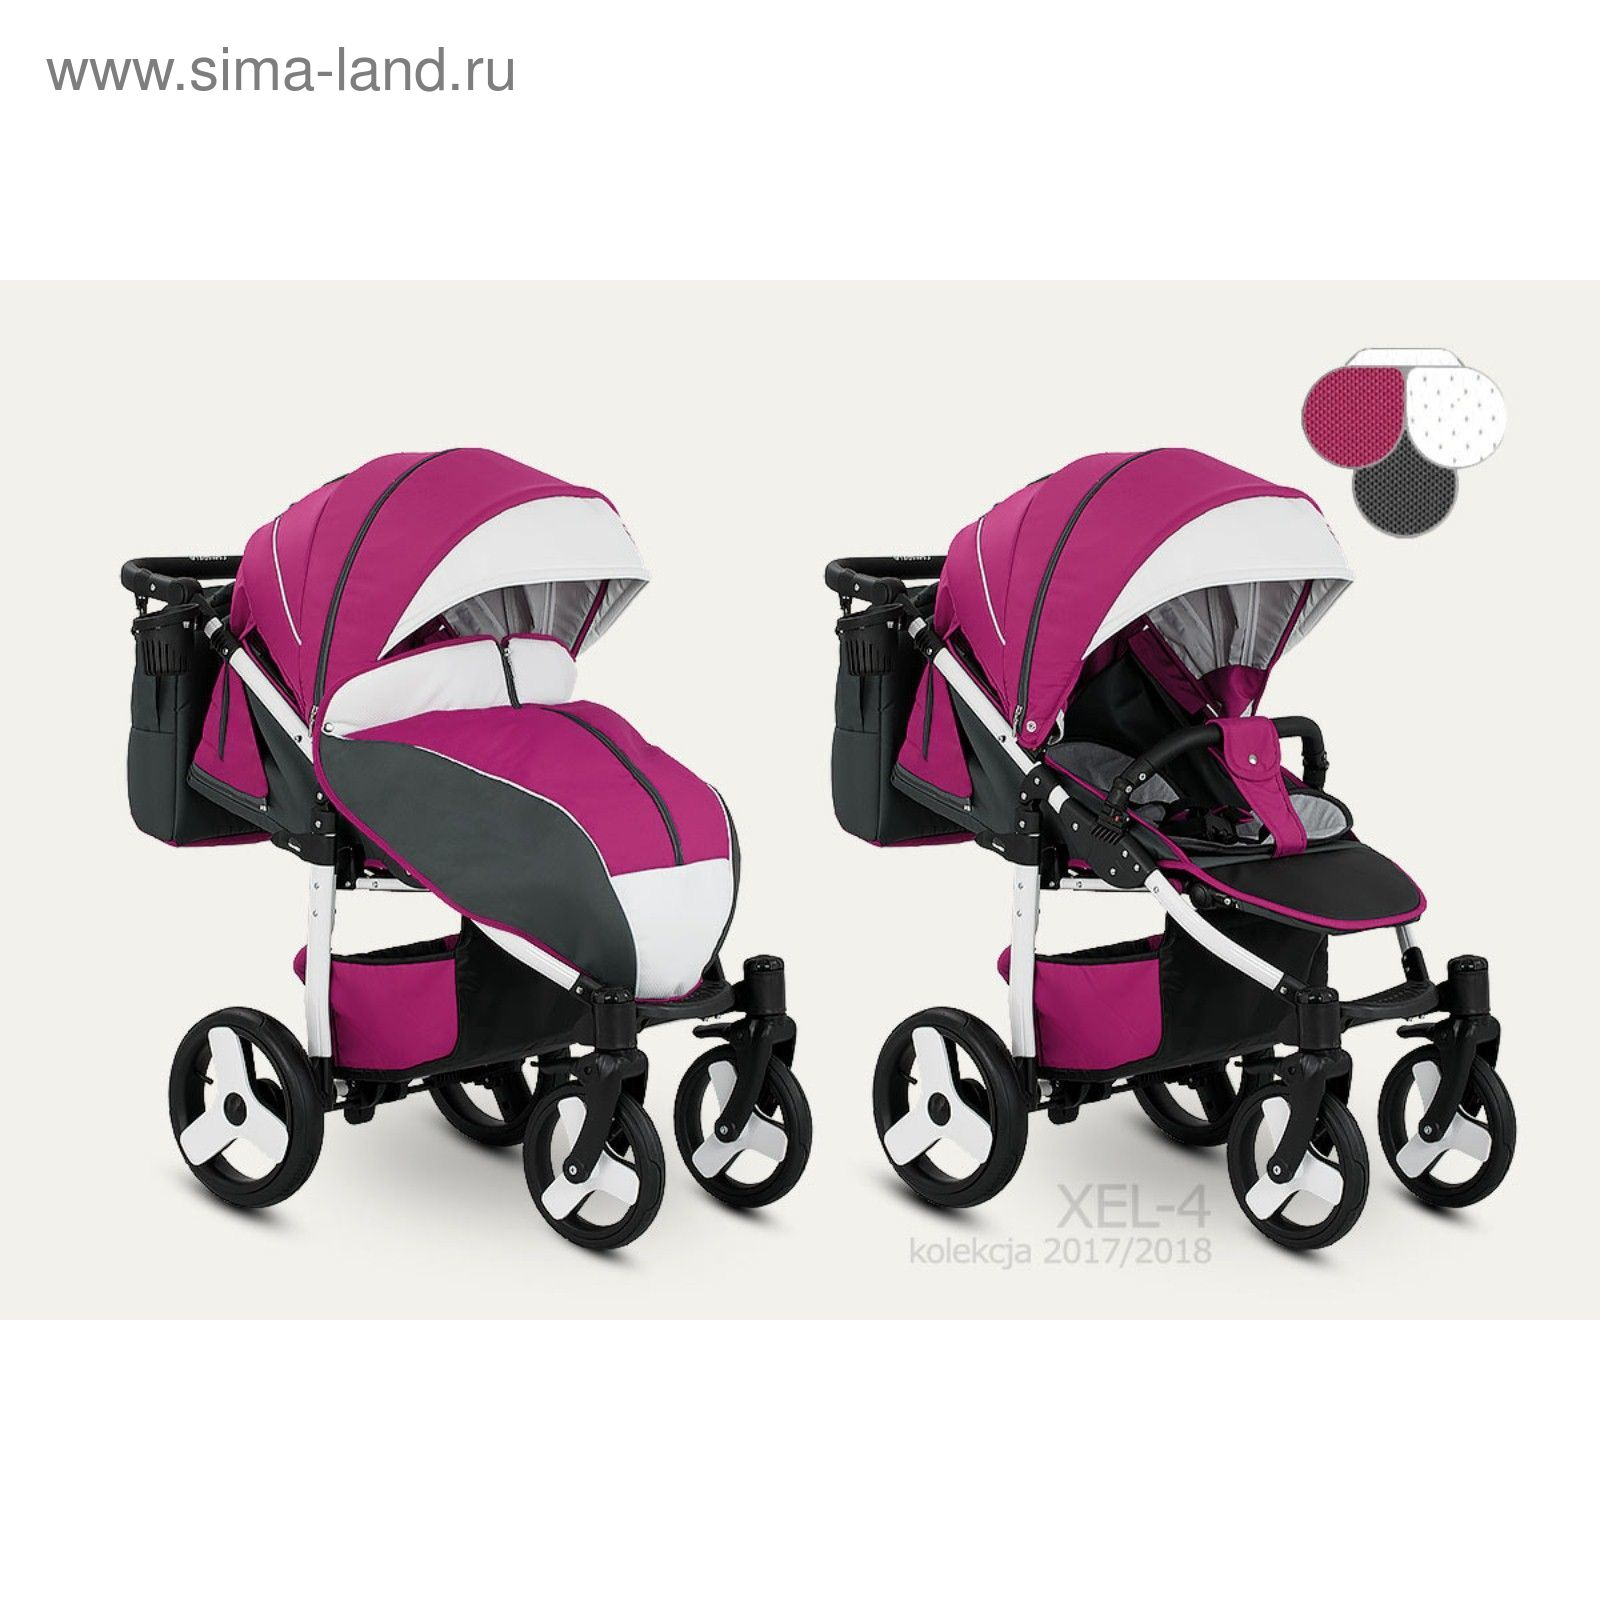 61a5f984f182cb Прогулочная коляска Camarelo Elf (Камарело Эльф) (цвет ХEL-04 ...